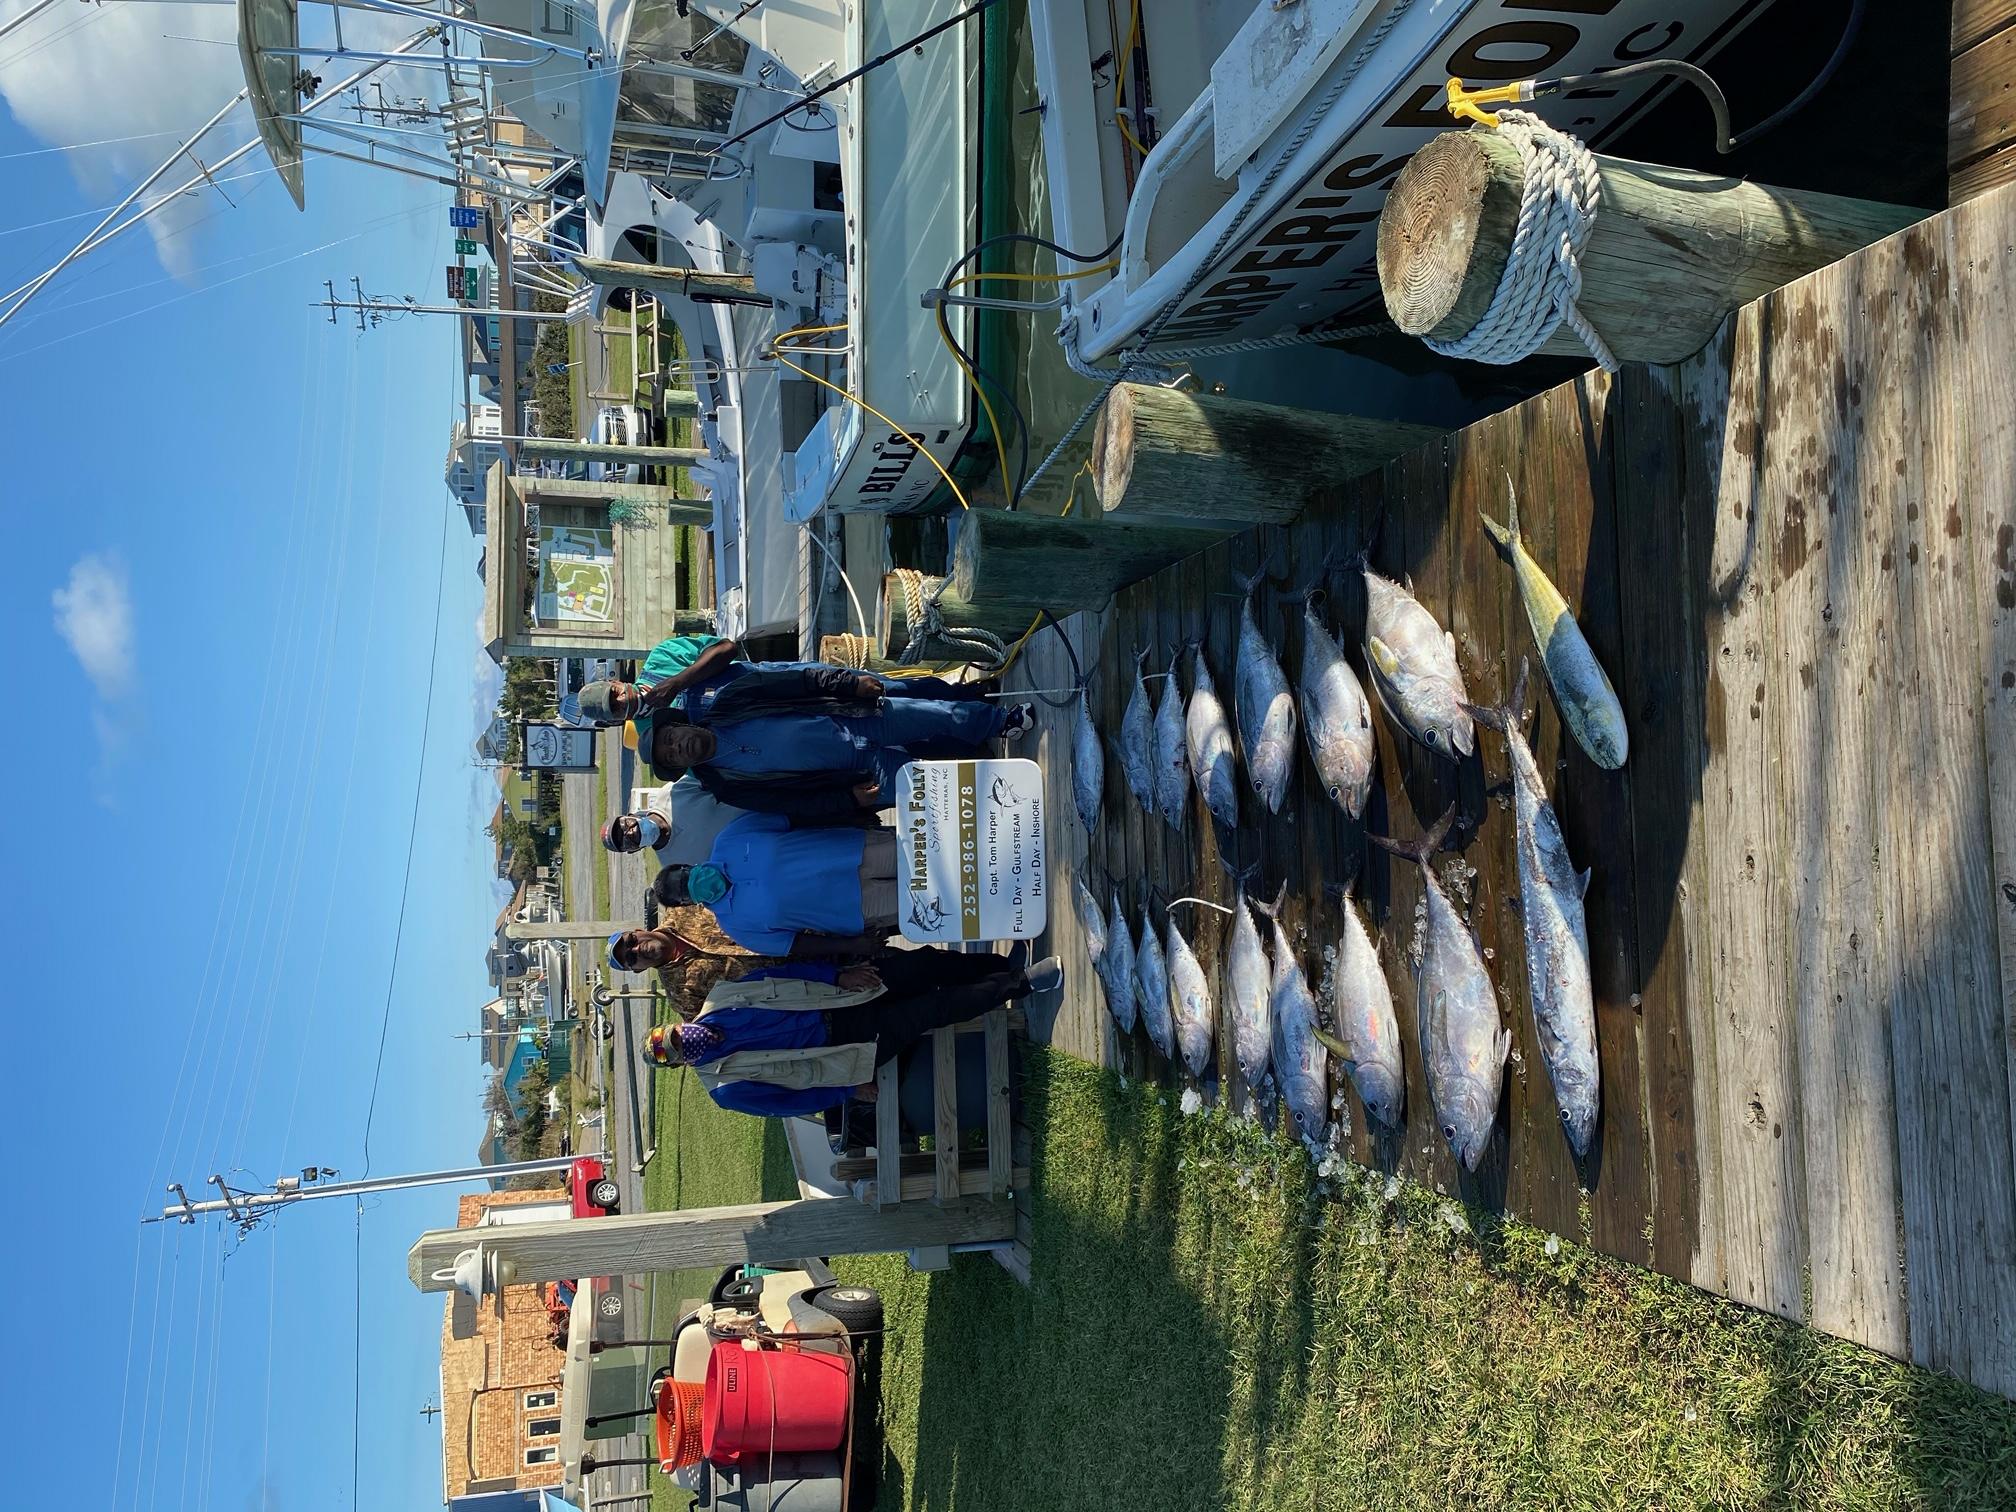 Hatteras Sportfishing Harper's Folly Teach's Lair Offshore